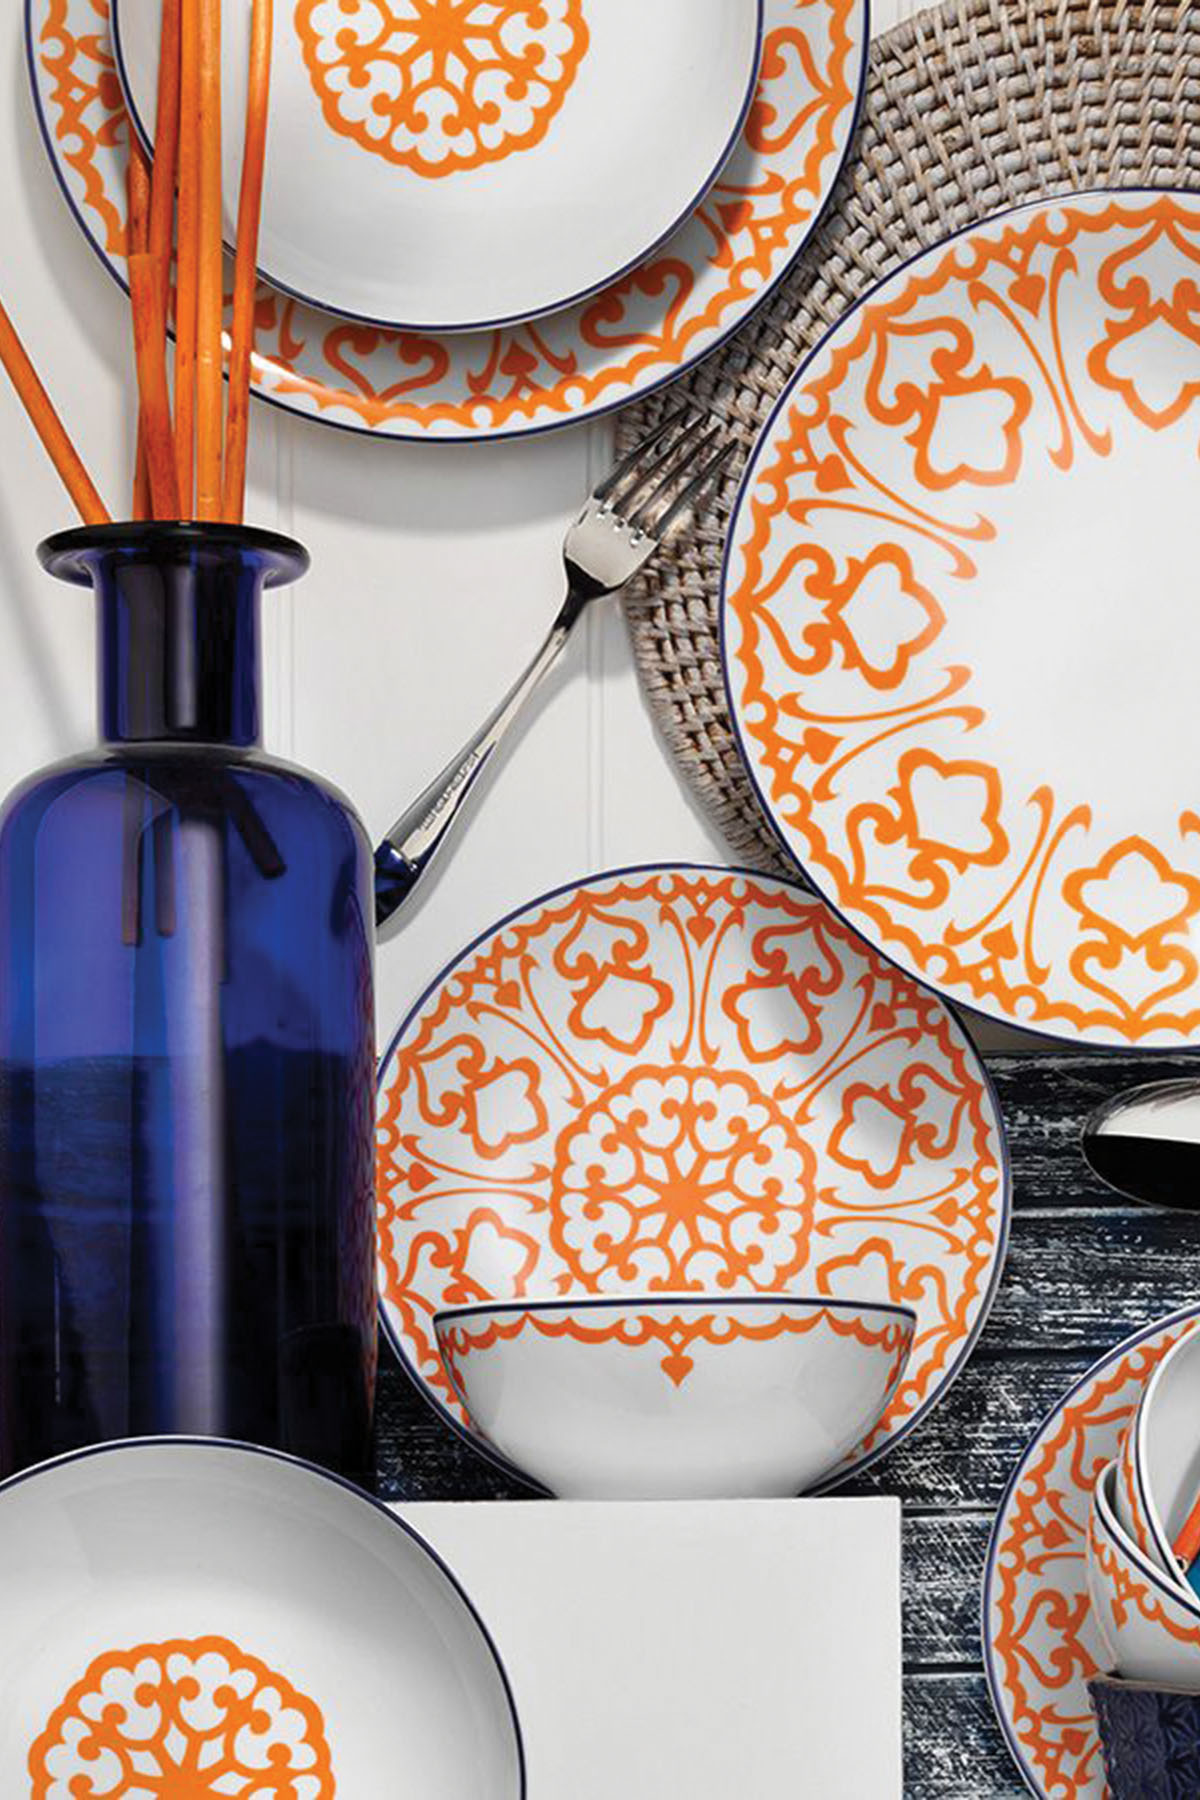 Kütahya Porselen - Kütahya Porselen 596619 Desen 24 Parça Yemek Seti Turuncu